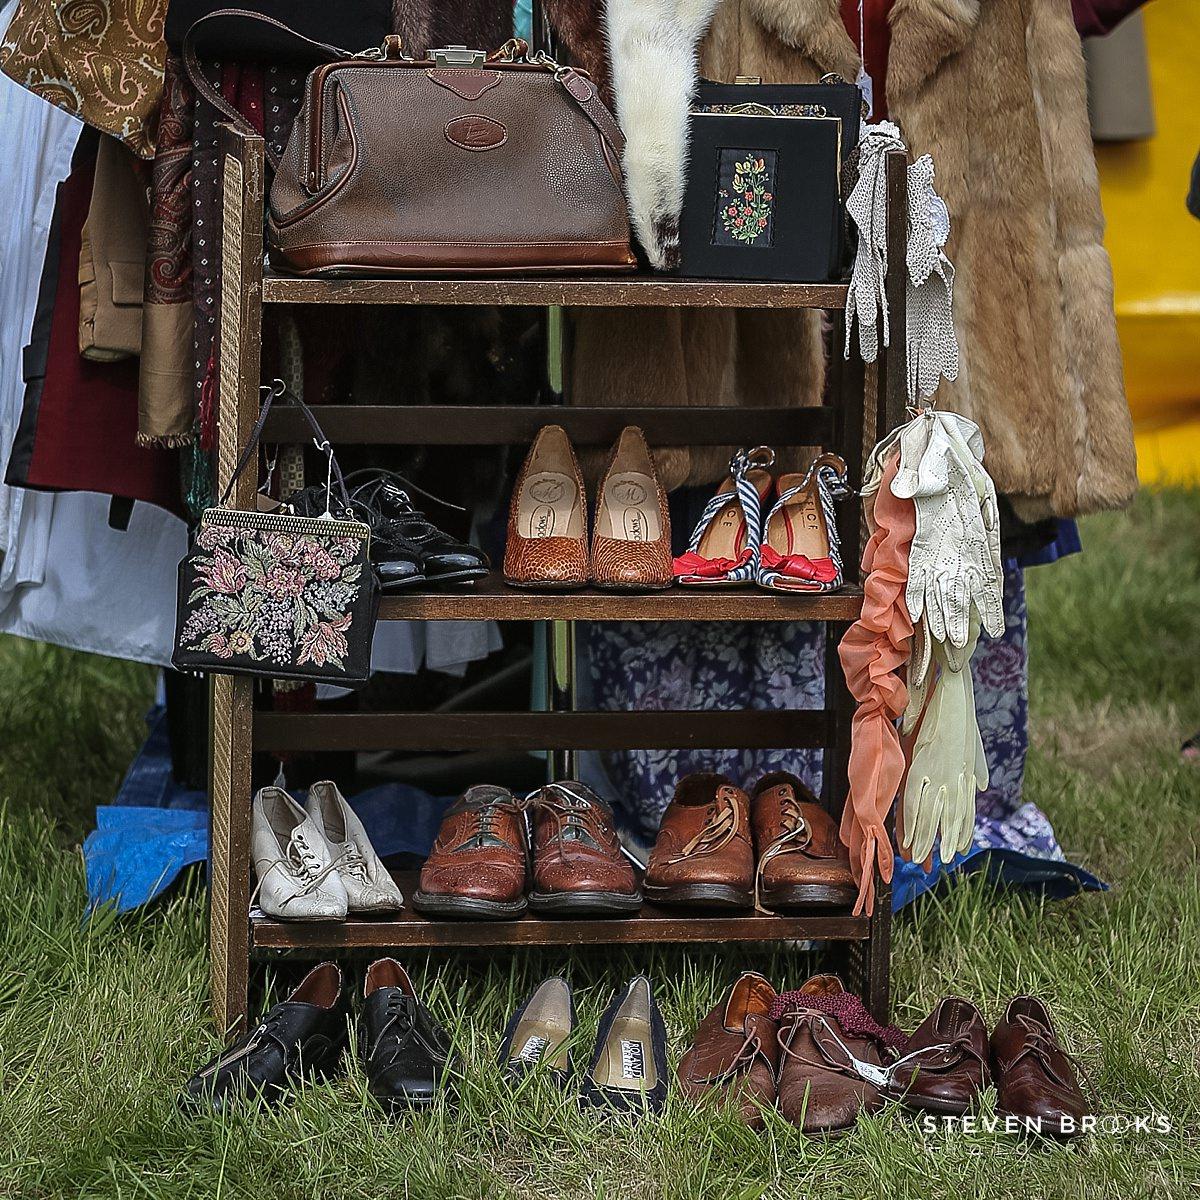 Norfolk photographer steven brooks photographs a rack of vintage shoes at Britain Does Vintage in Norfolk